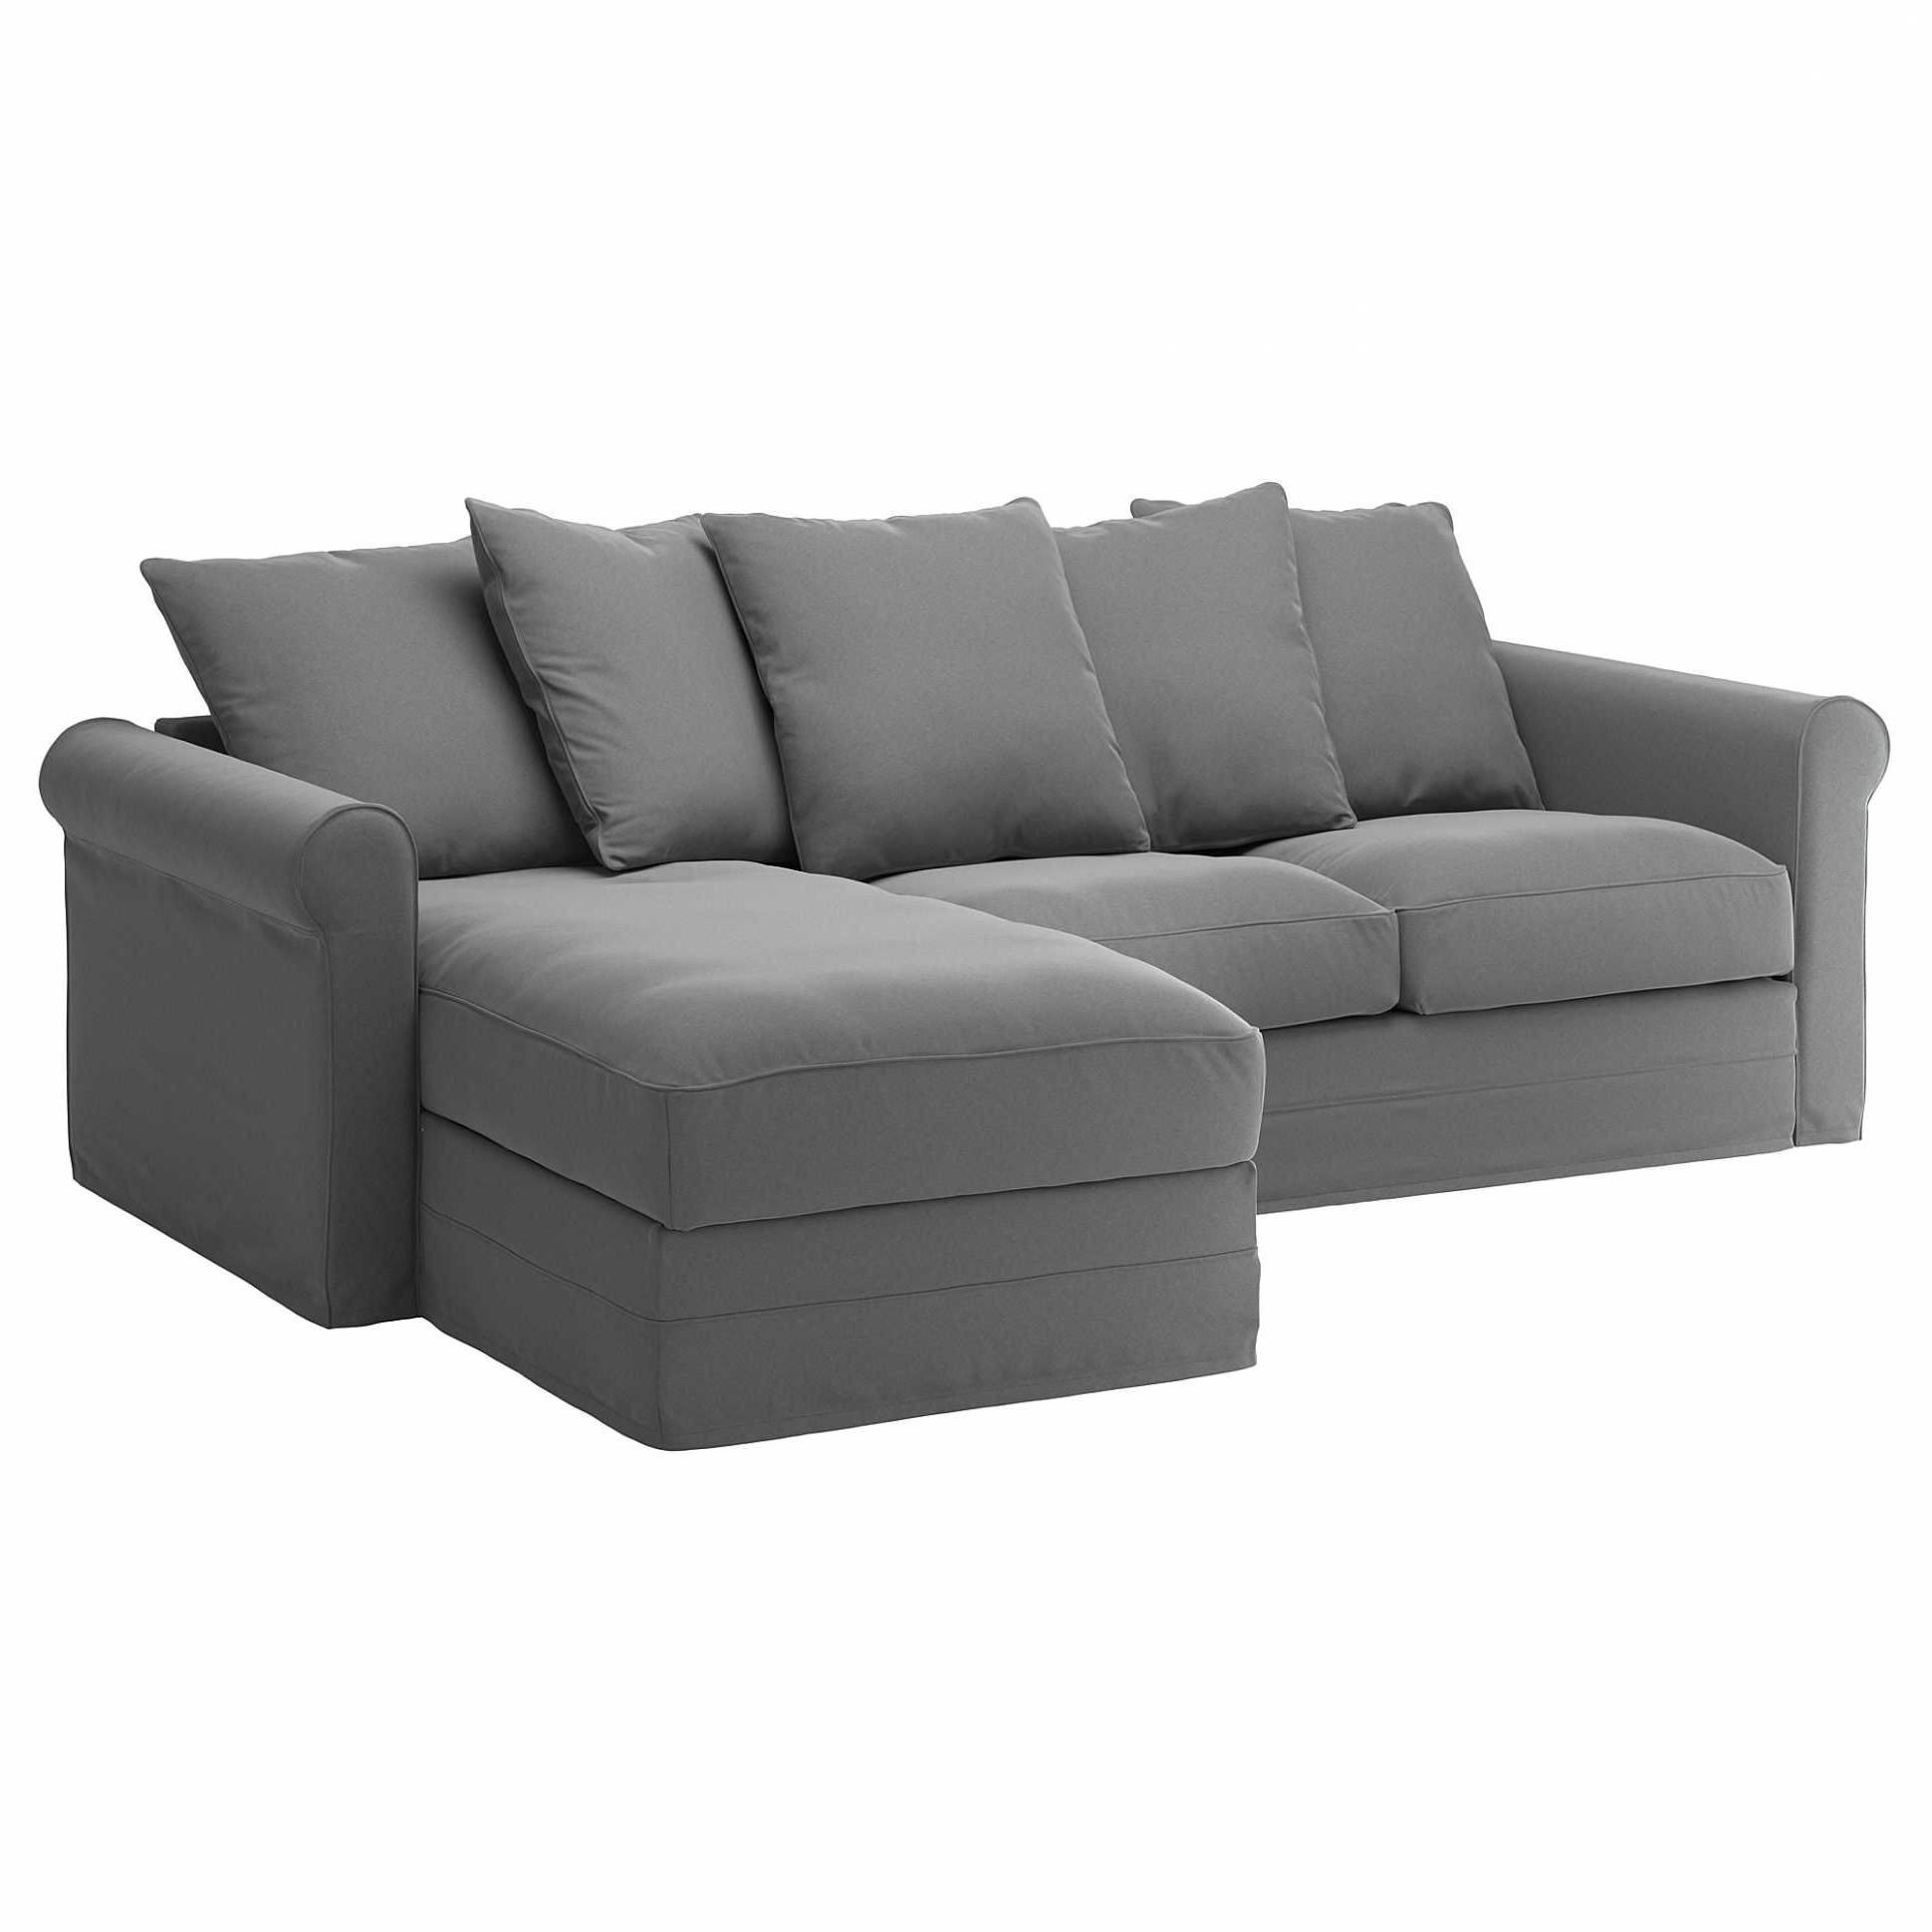 Sofas Y Sillones Ikea 0gdr sofà S Y Sillones Pra Online Ikea Shanerucopy